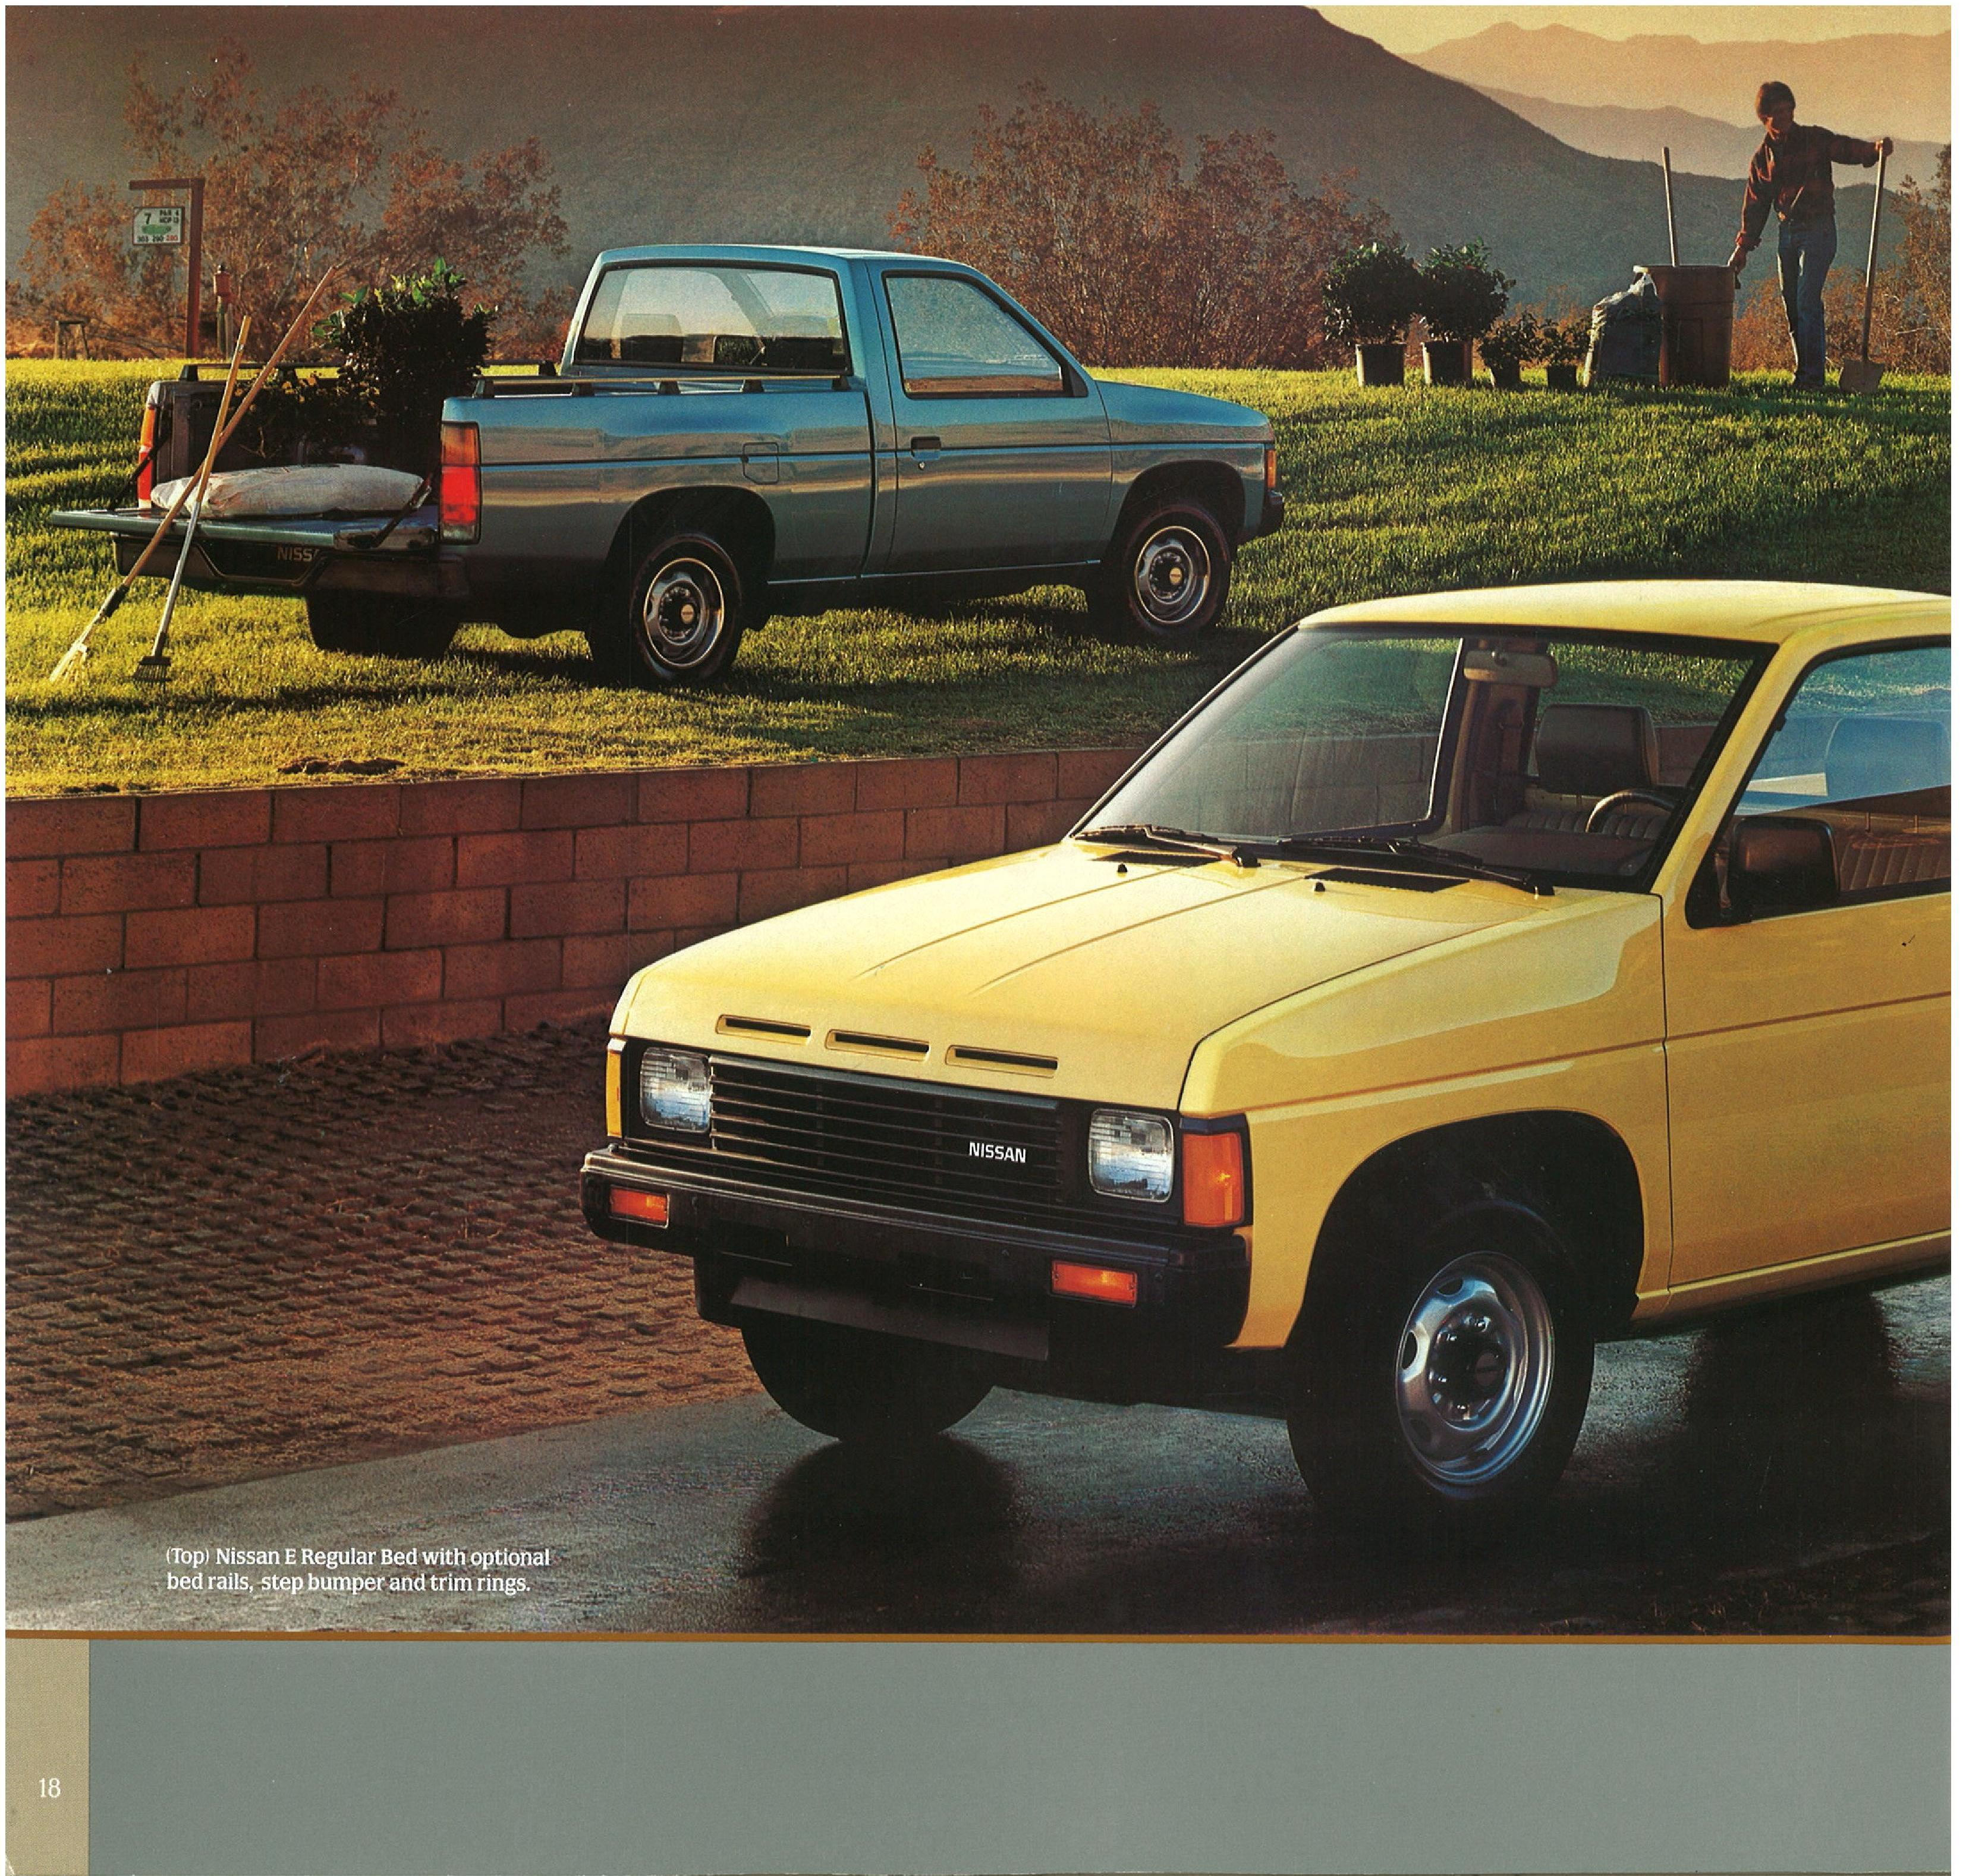 1986 5 nissan hardbody trucks brochure. Black Bedroom Furniture Sets. Home Design Ideas